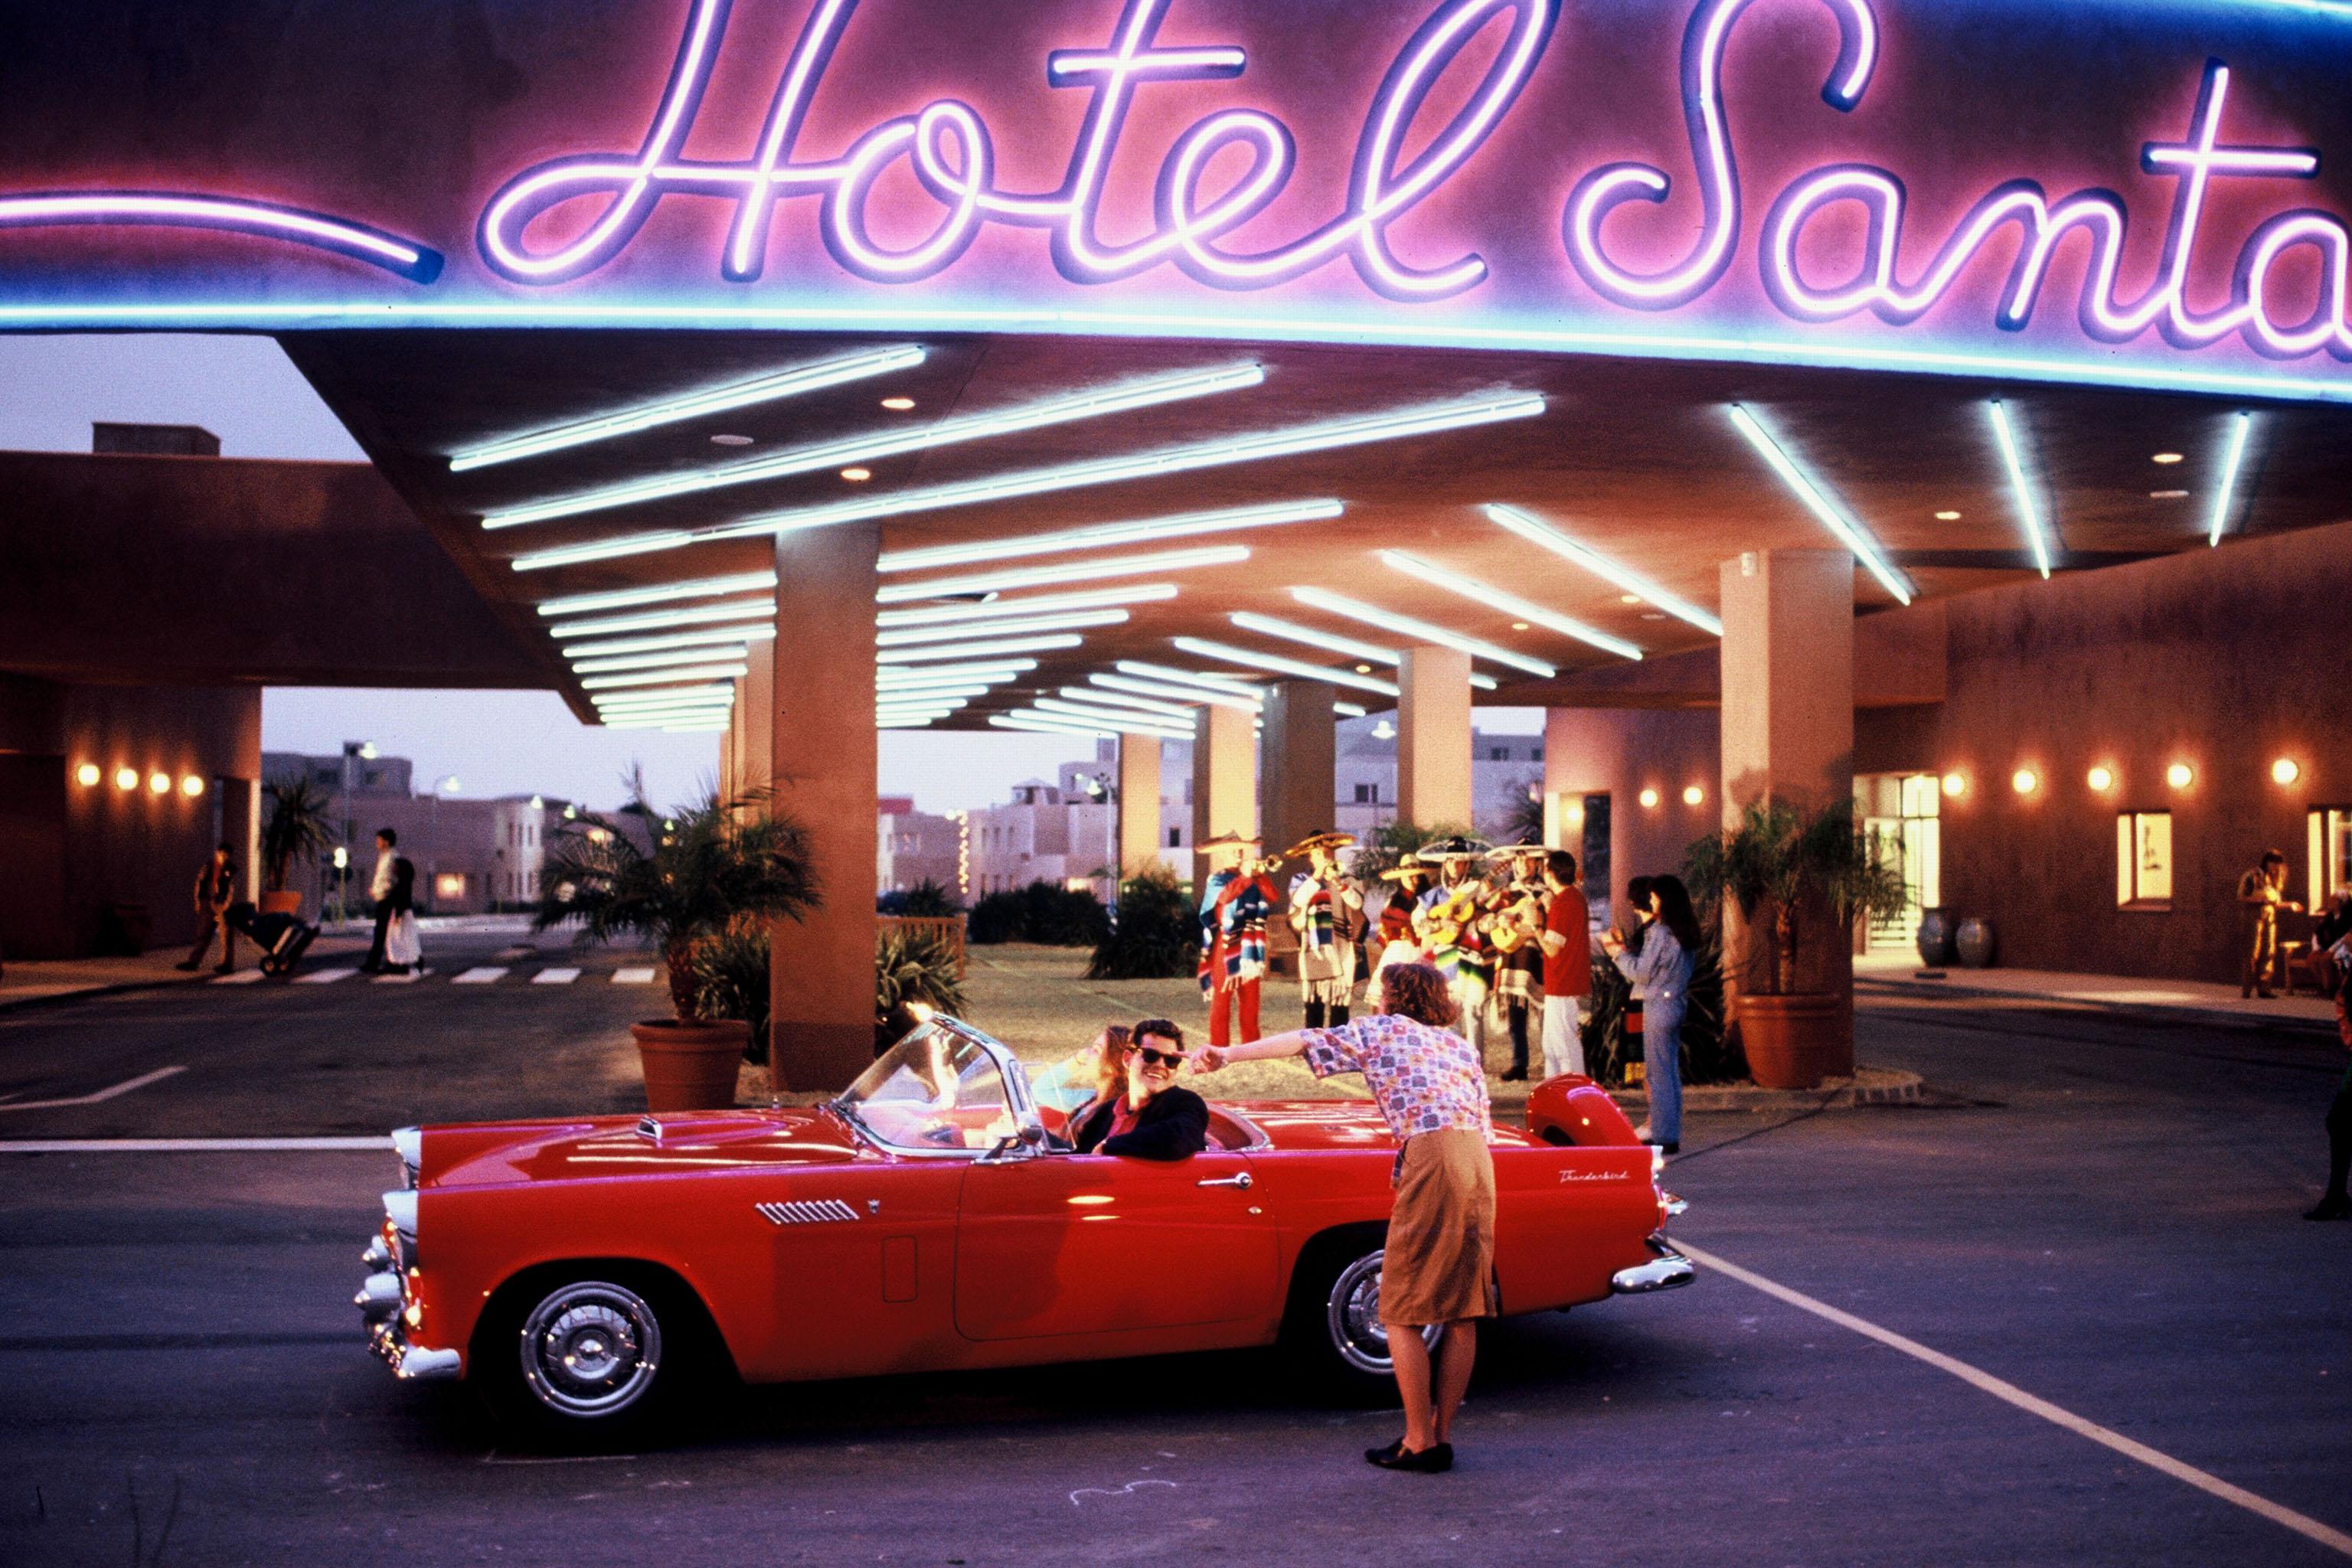 Santa Fe Hotel Disneyland Paris Reviews